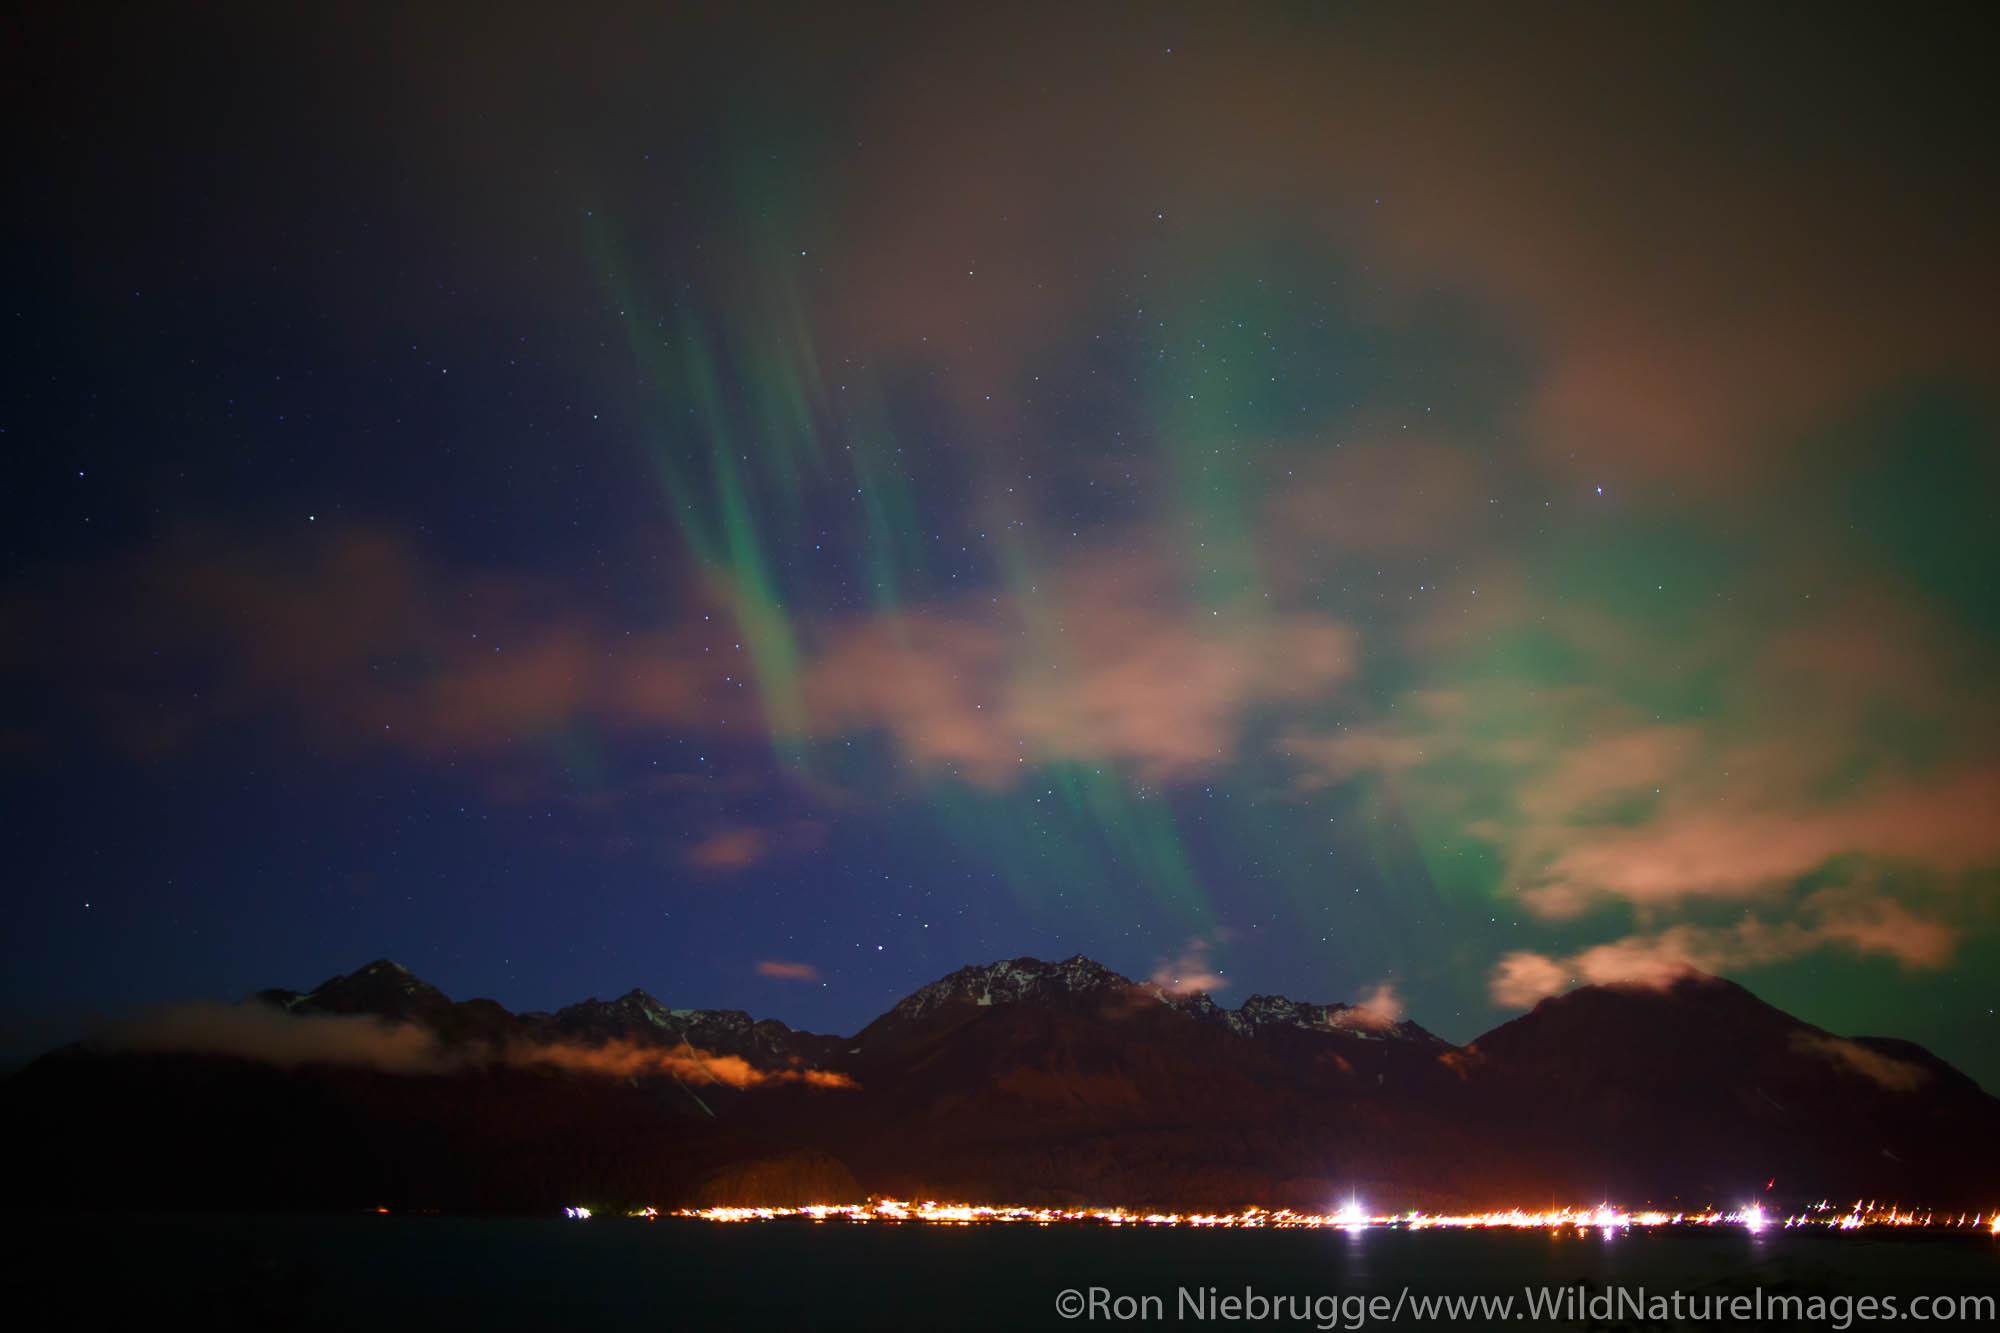 Northern Lights, also known as Aurora borealis, Alaska